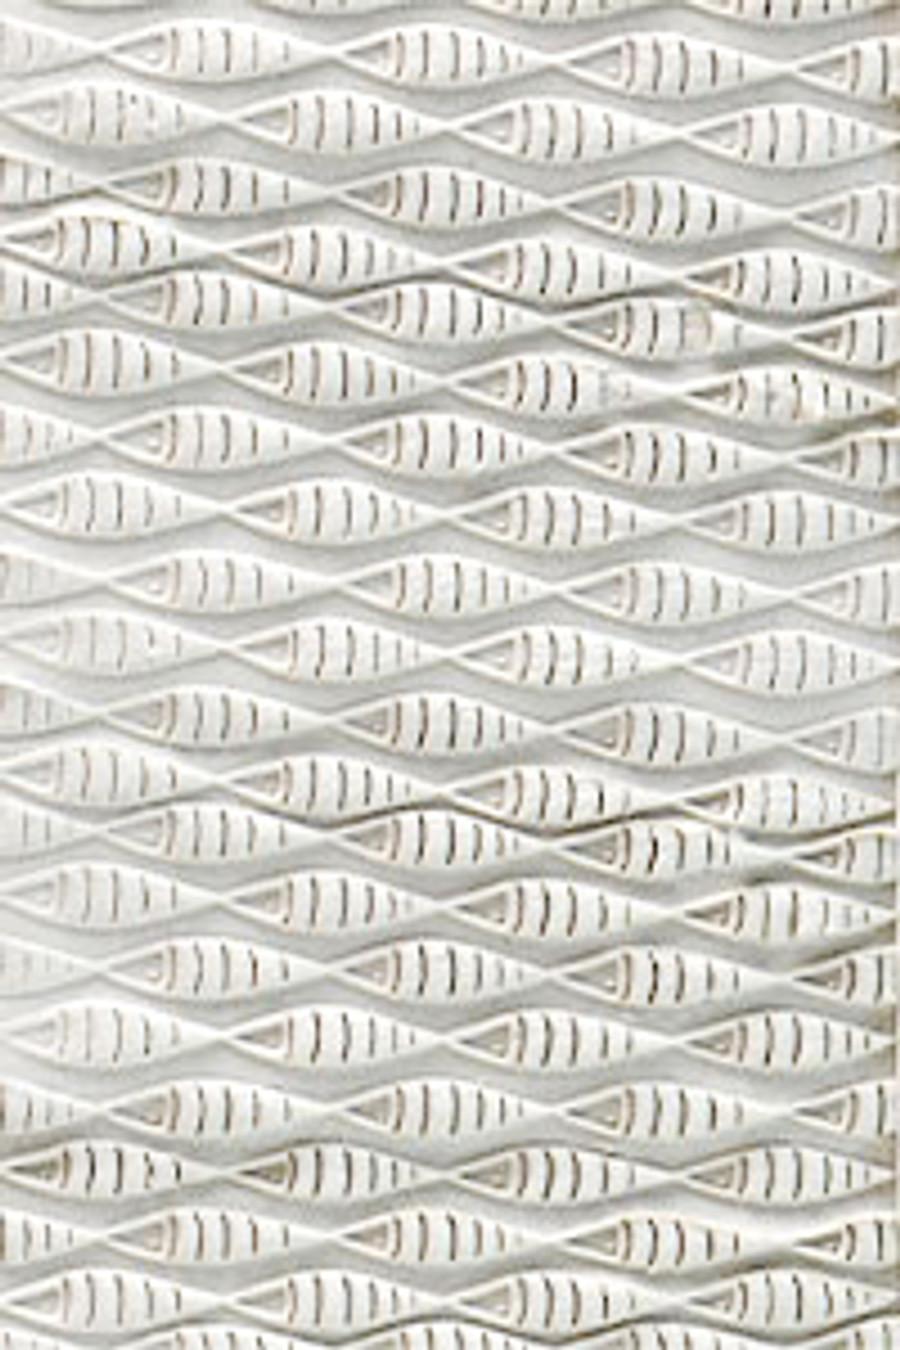 Acrylic Texture Small Roller (KTR) - School of Fish - 5cm